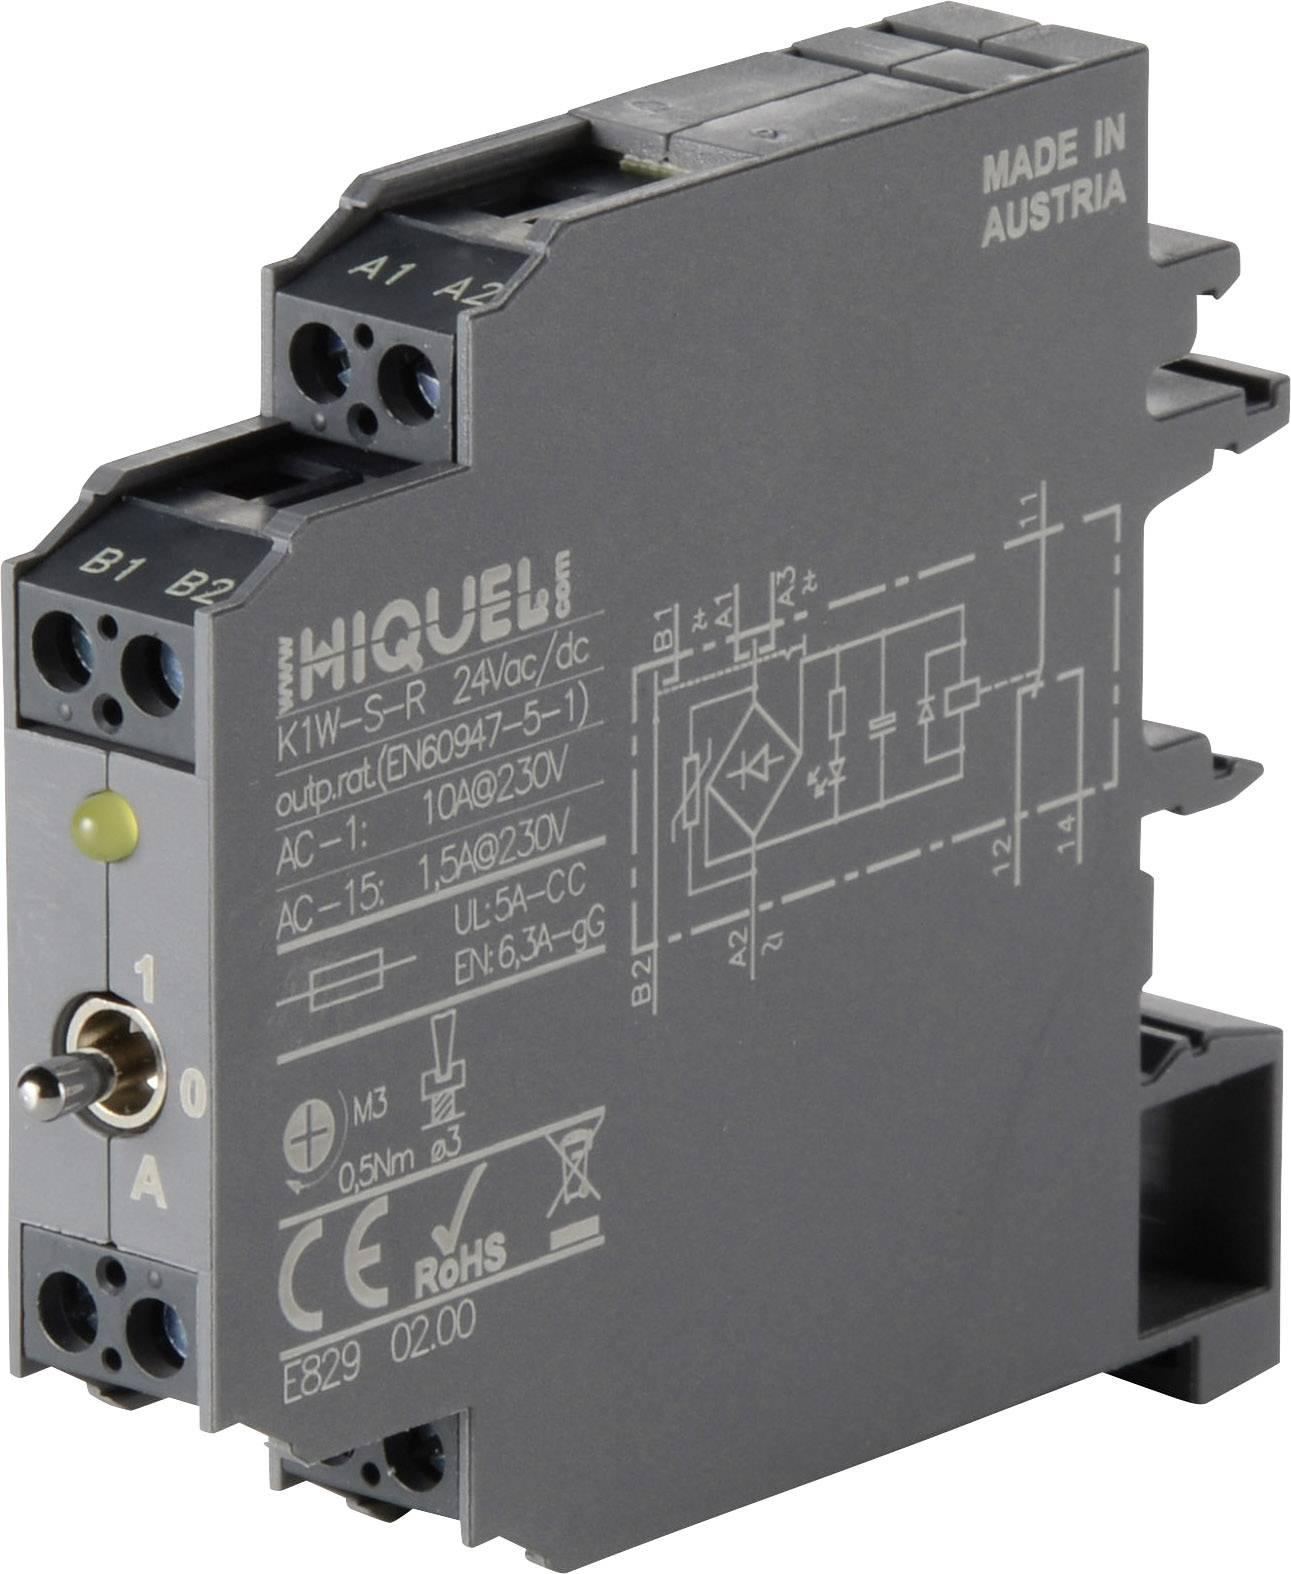 Vazební relé Hiquel, K1W-S-R 24 V/AC/DC, 10 A, 12 mm